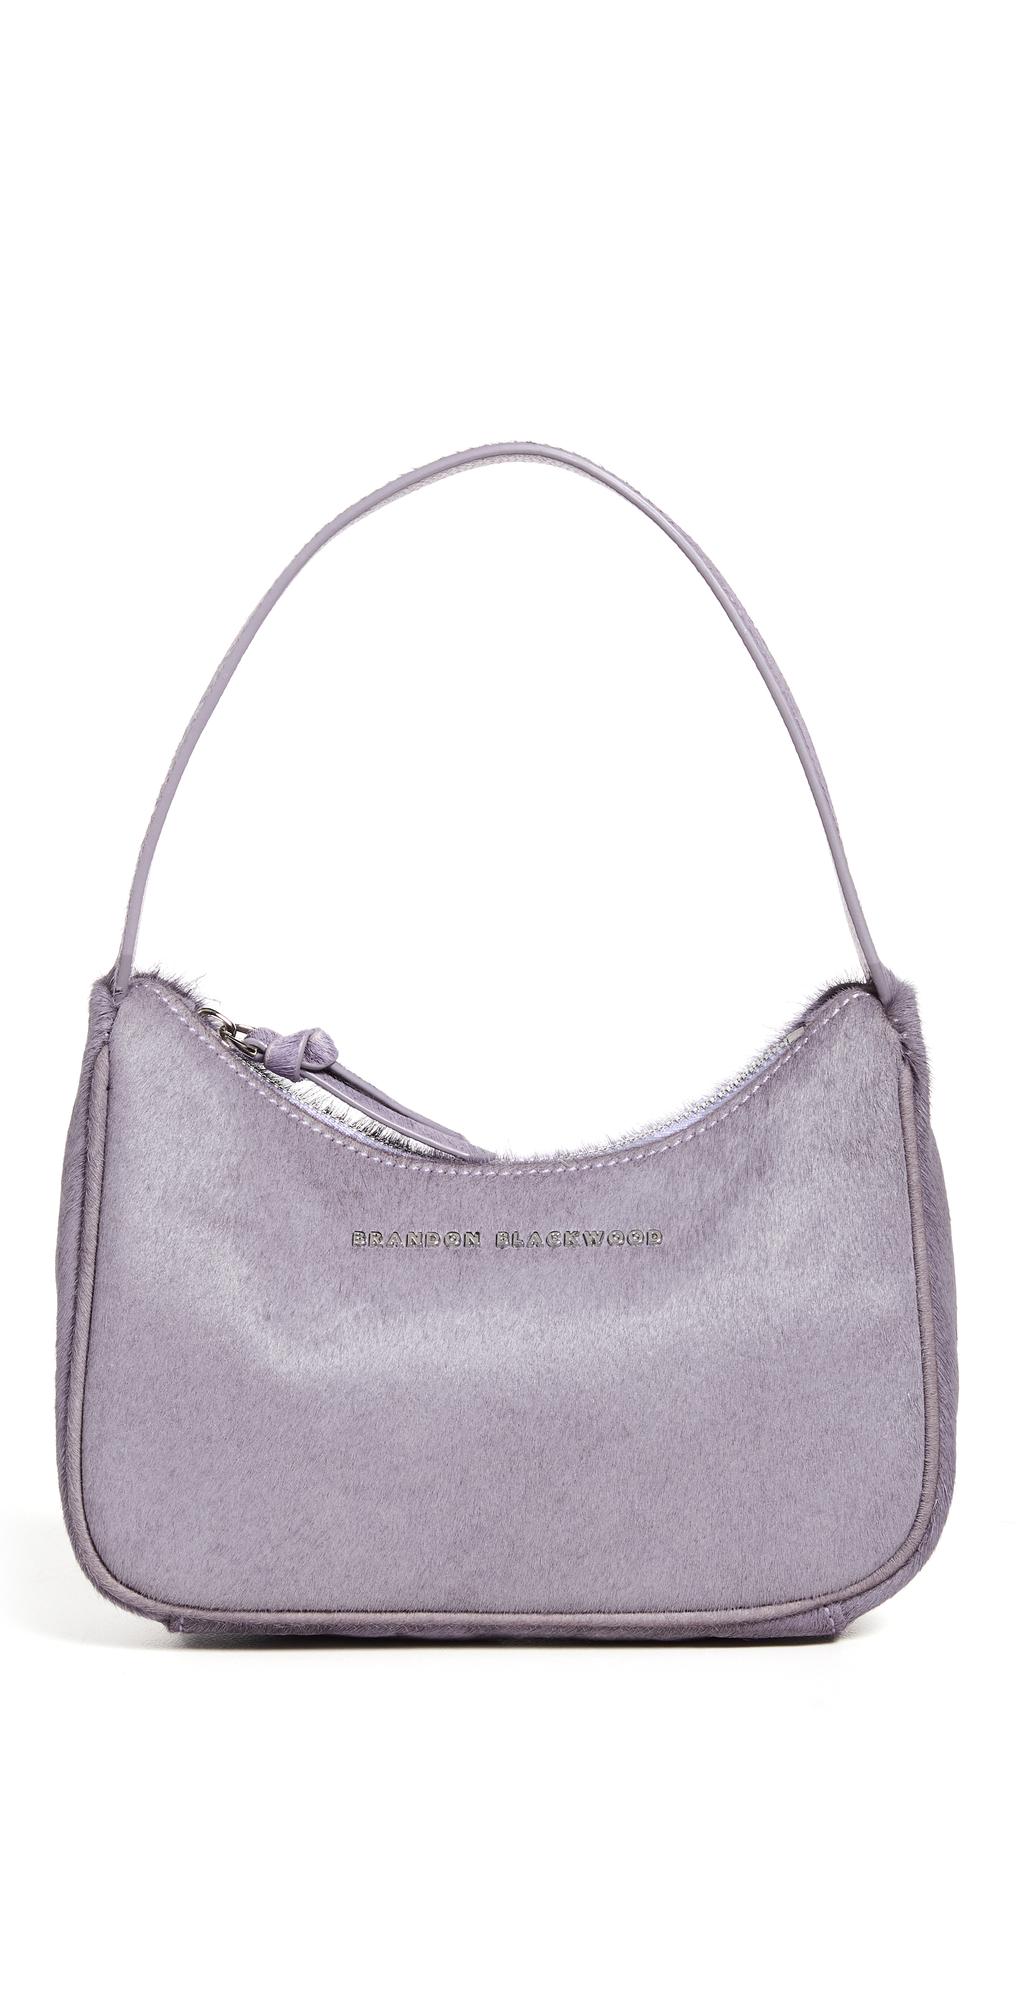 The Syl Bag